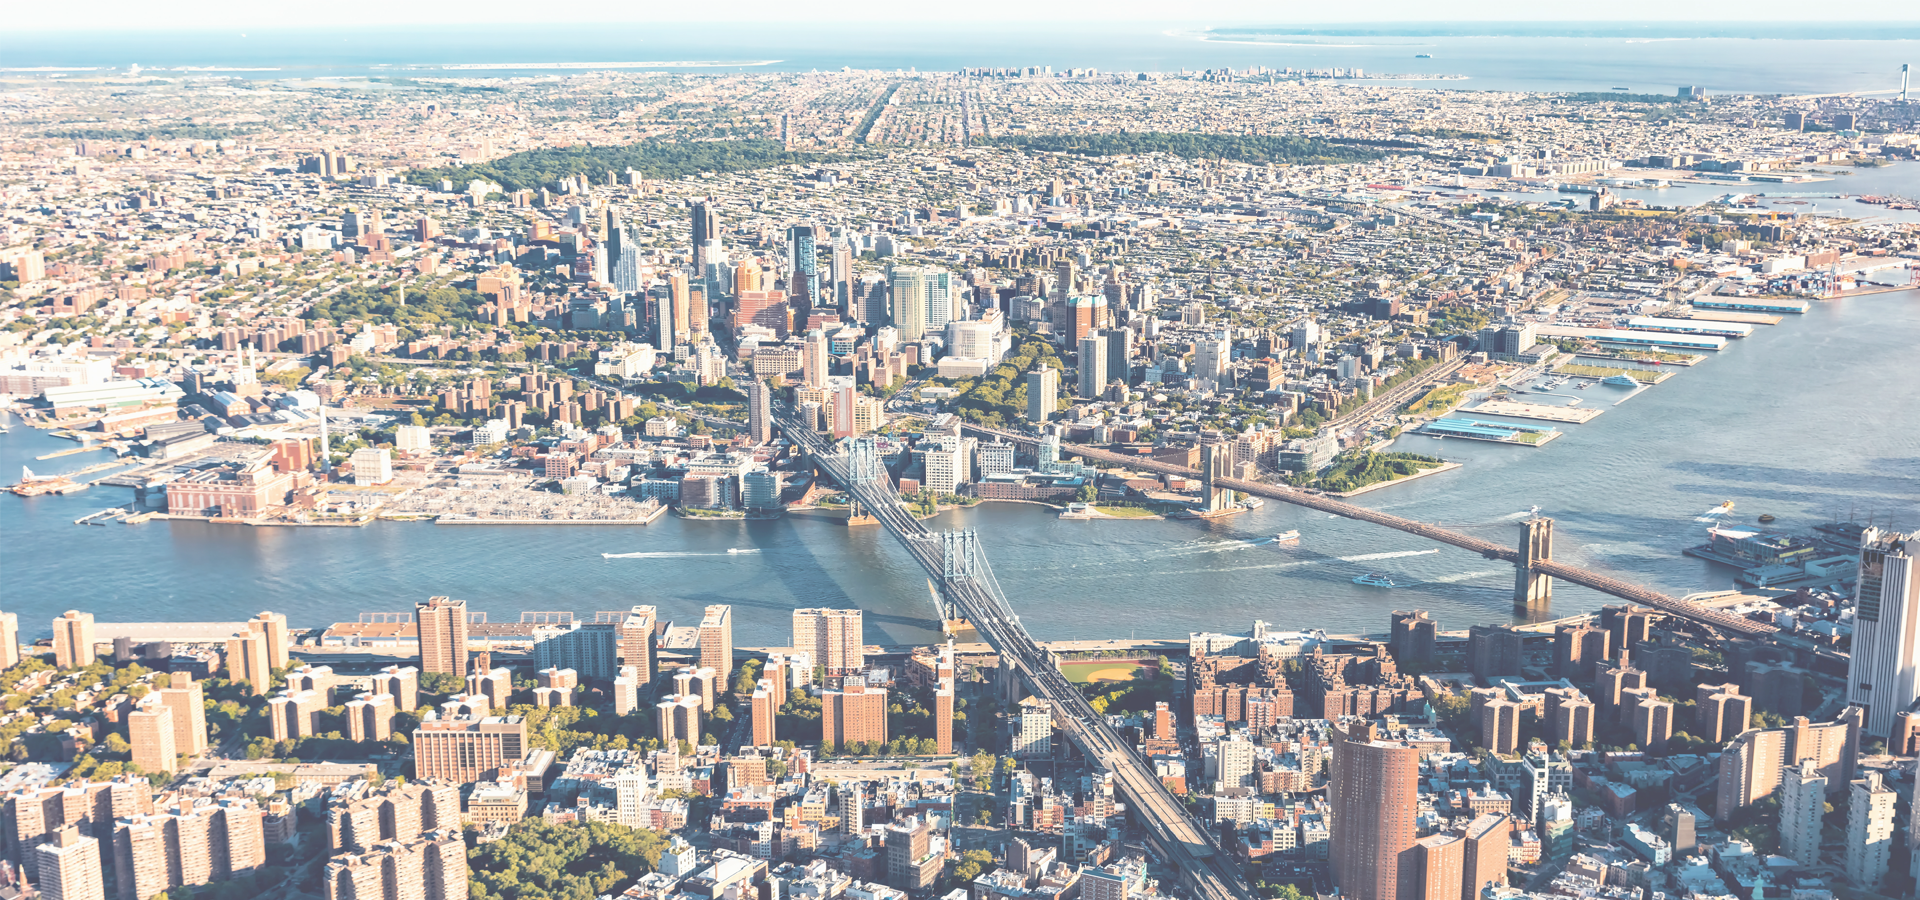 Peer-to-peer advisory in Brooklyn, New York, USA